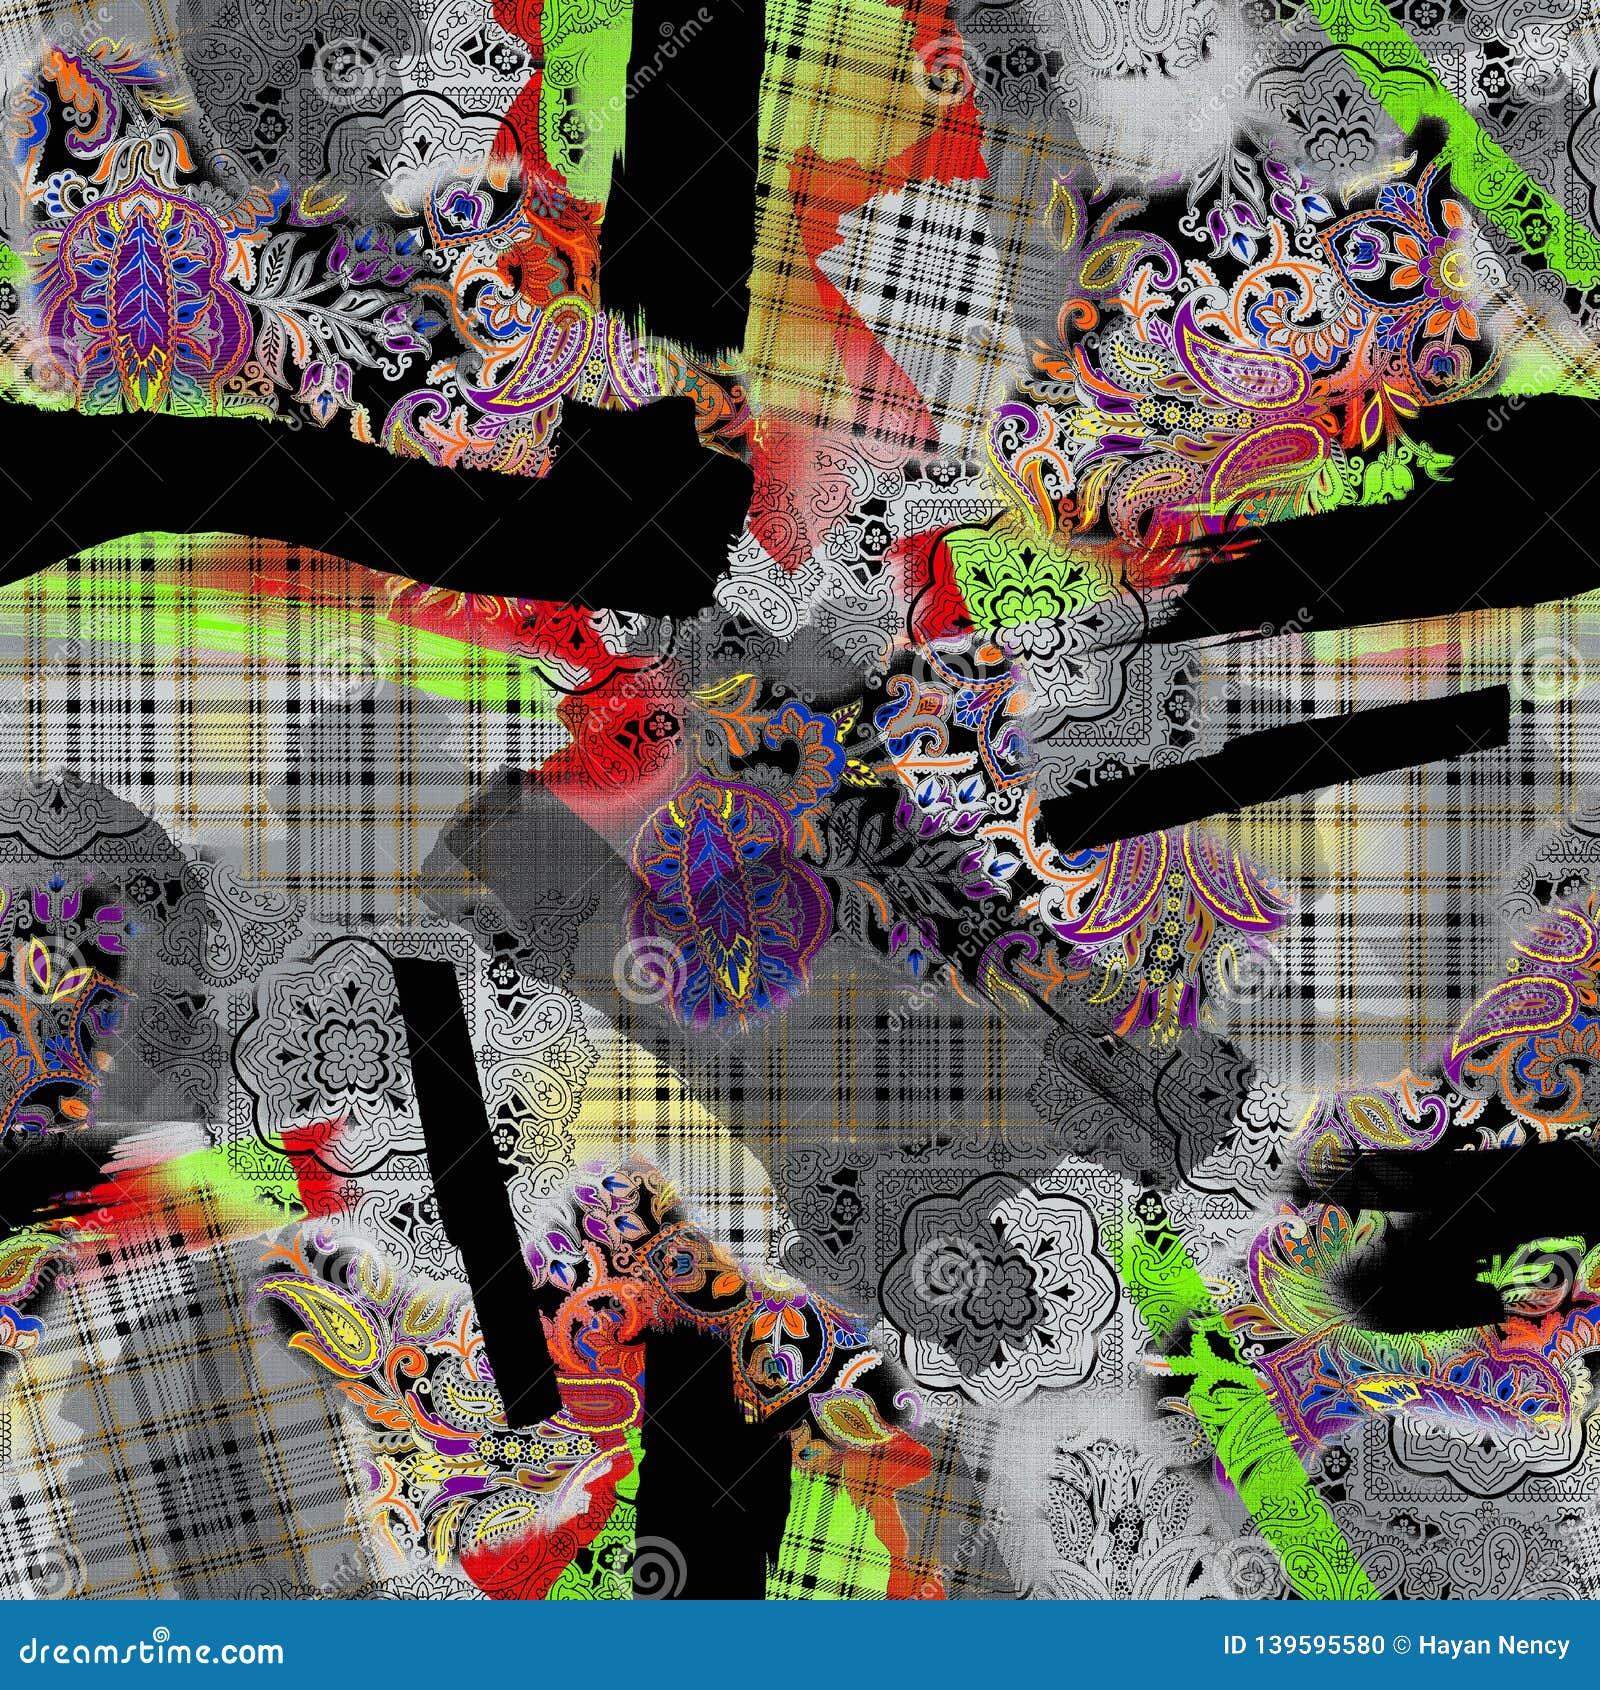 Seamless watercolor digital paisley and checks pattern